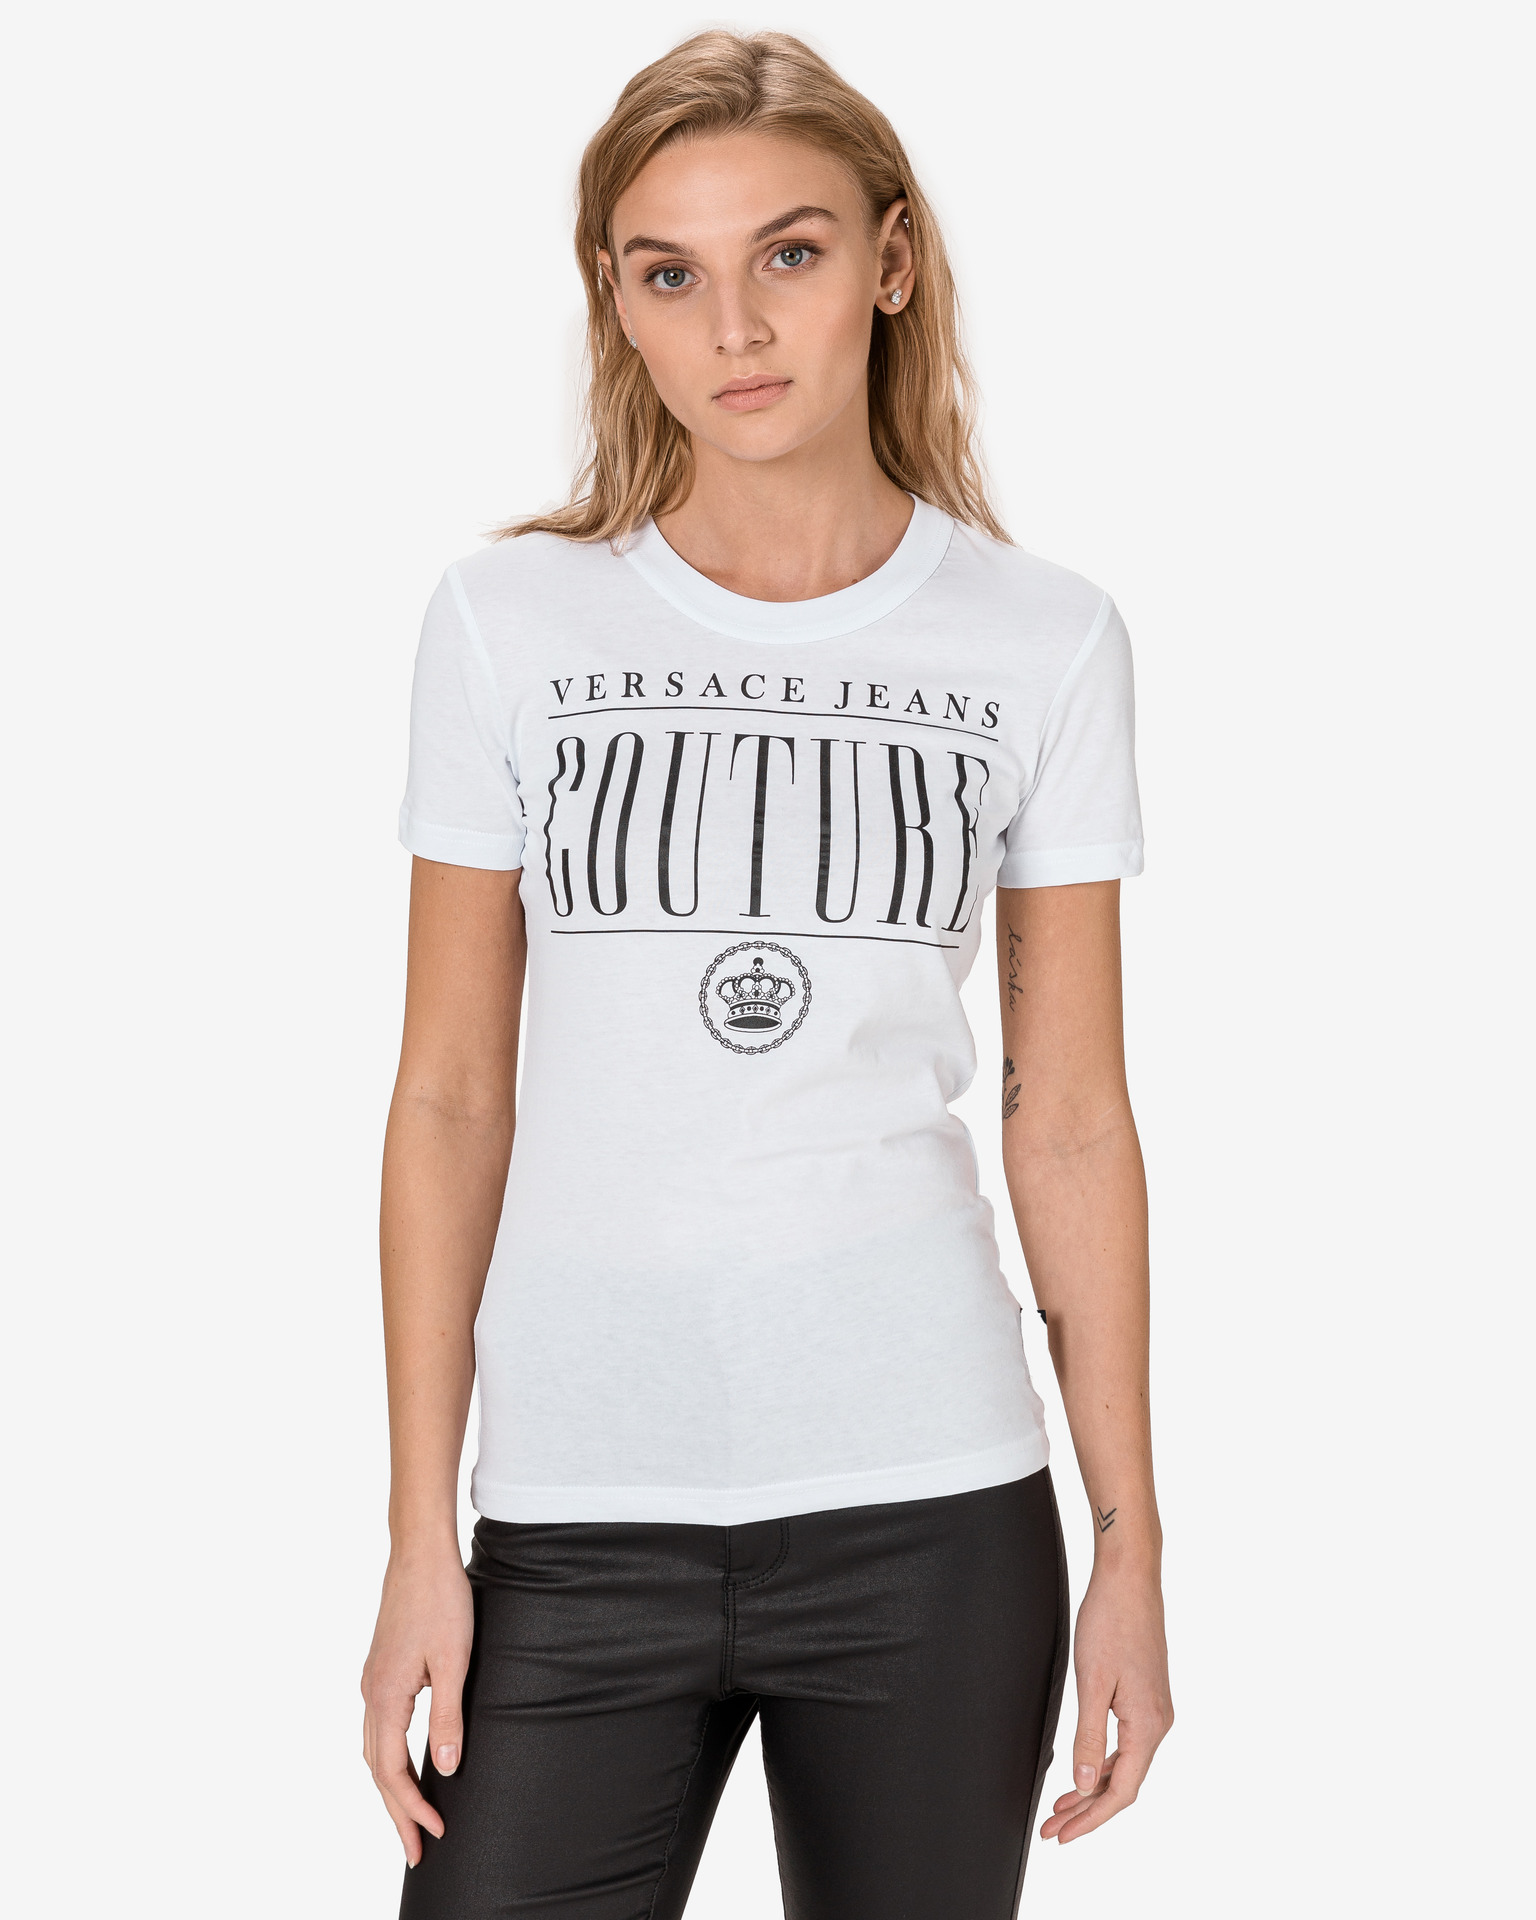 Versace Jeans Couture Koszulka Biały